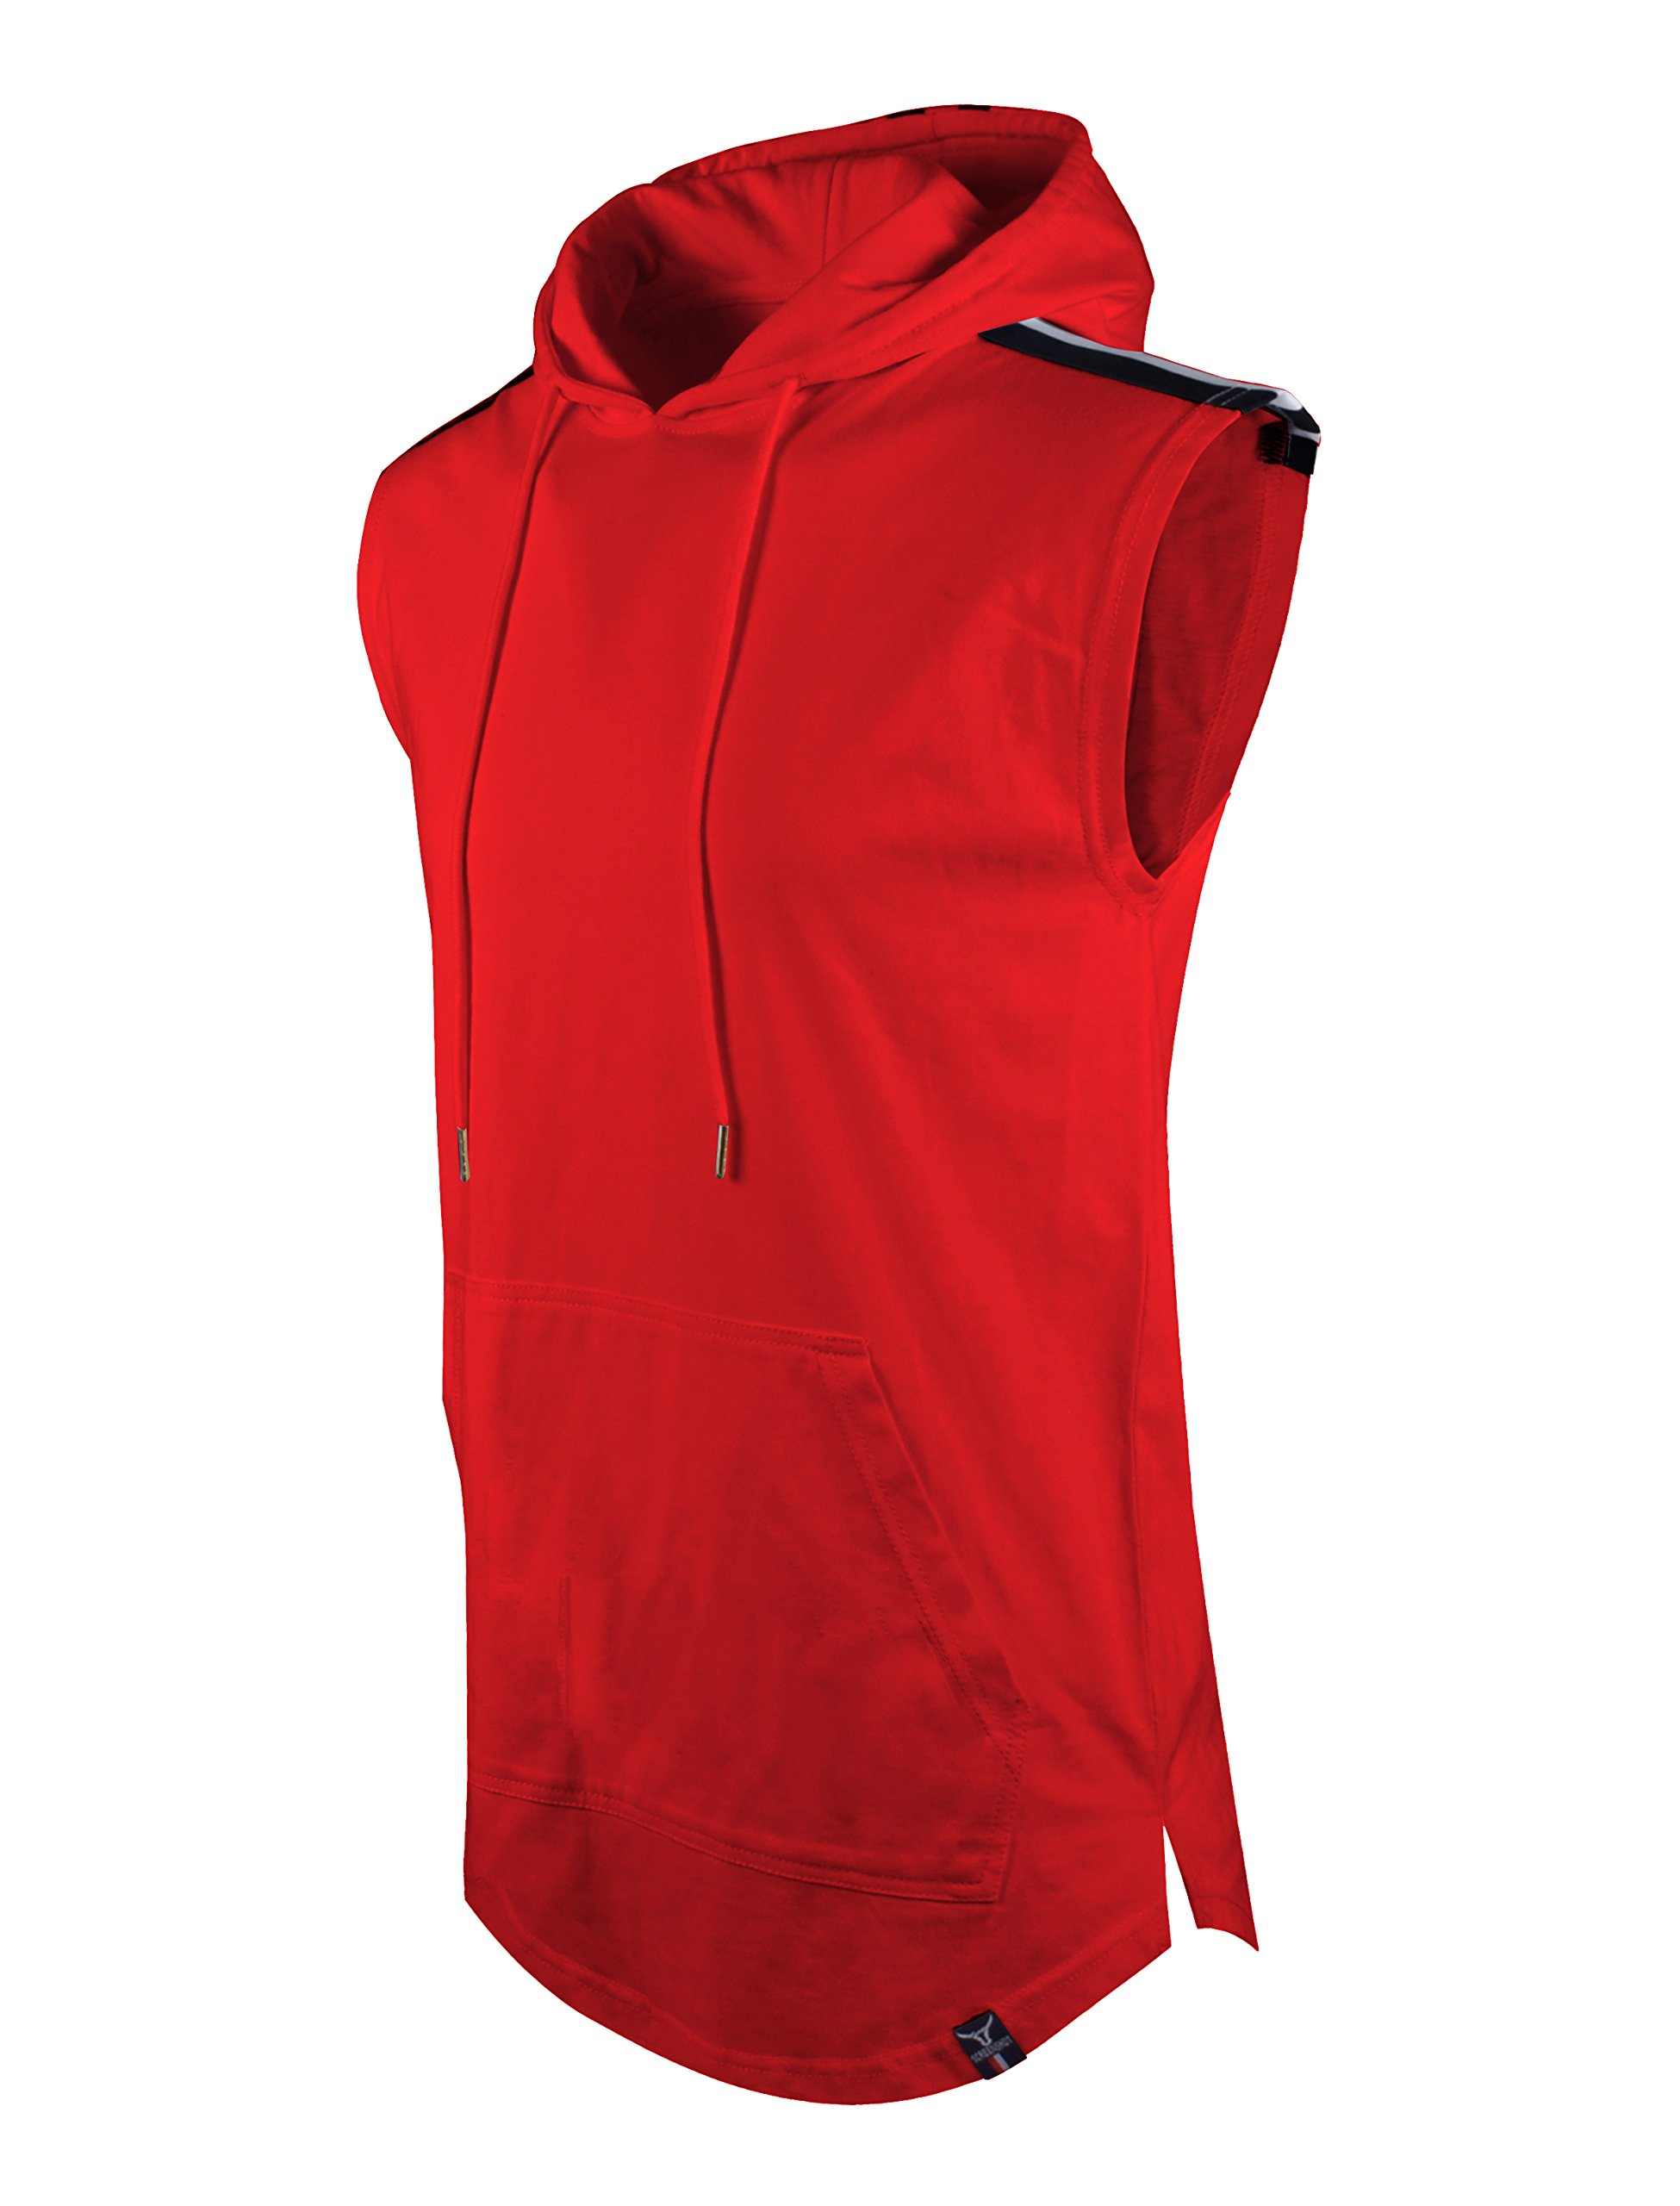 MOKEWEN Mens Back Zipper Hooded Sleeveless T-Shirt